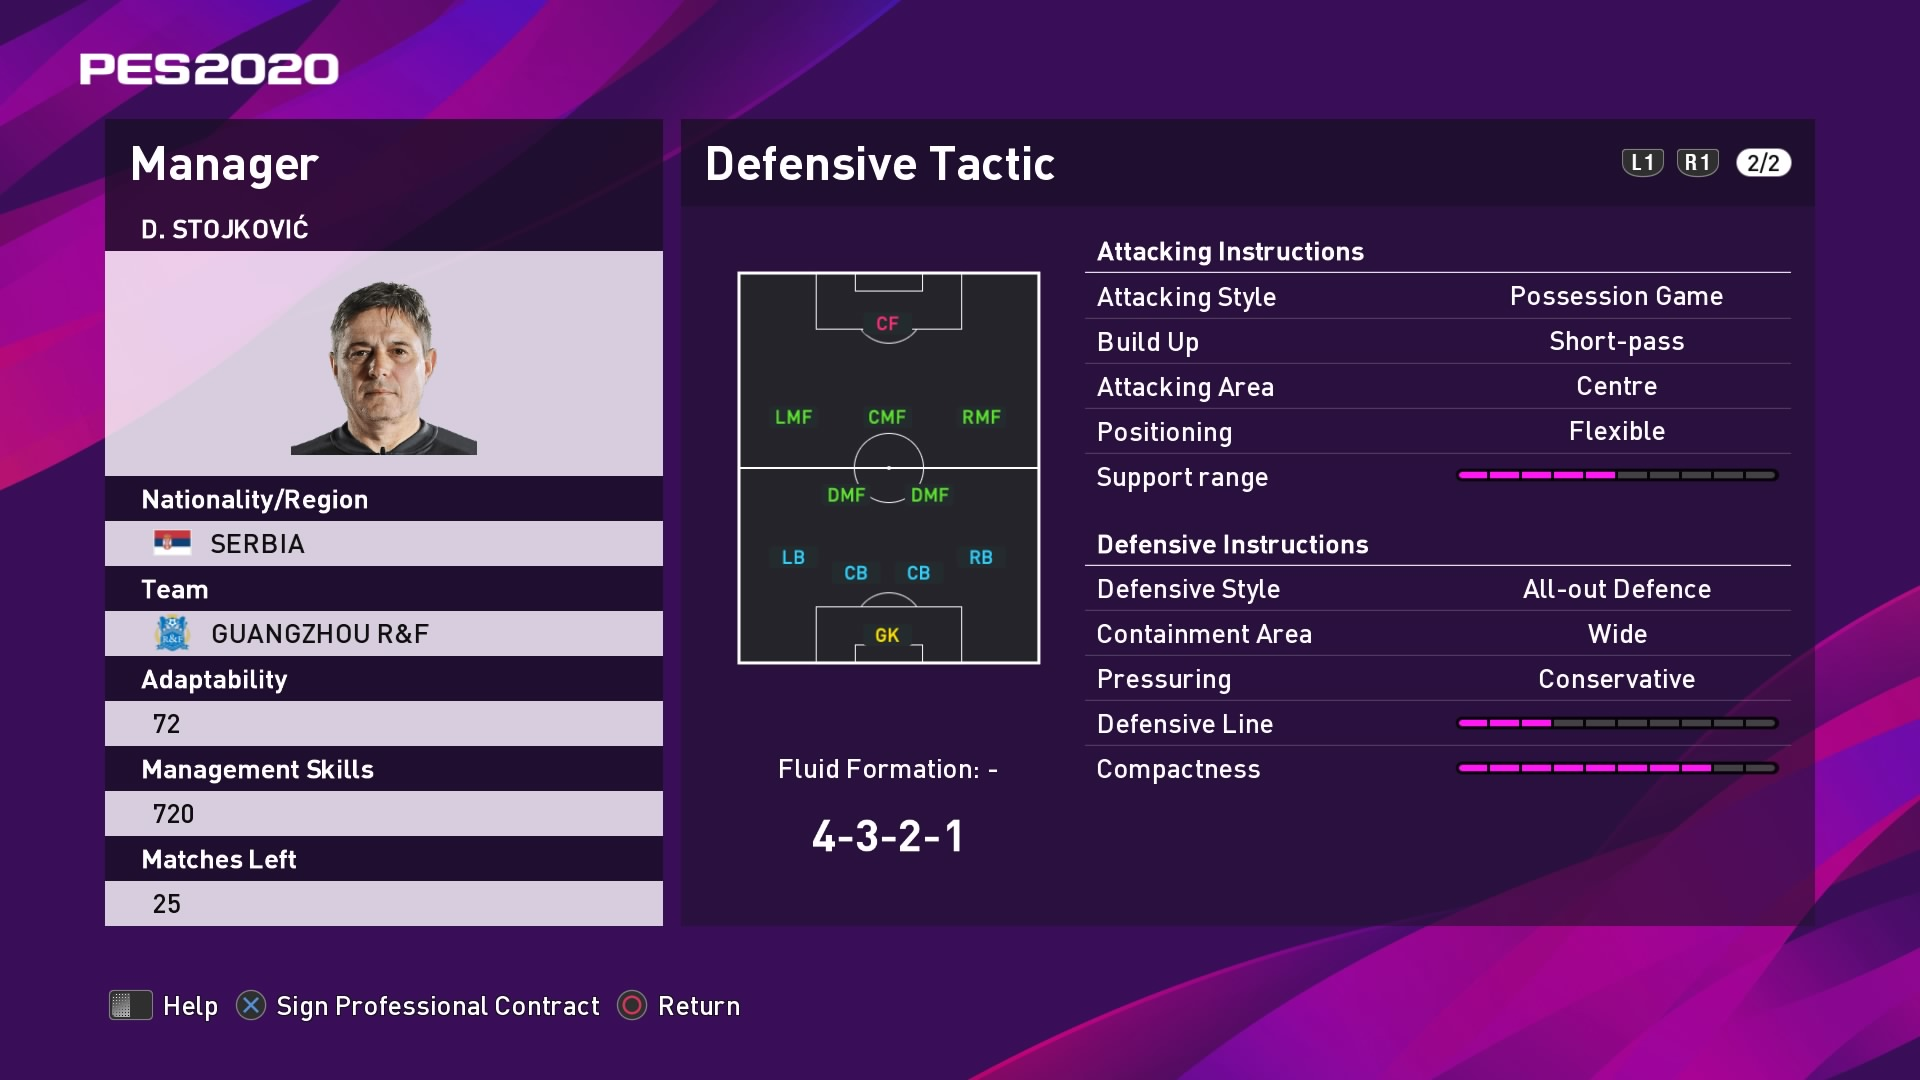 D. Stojković (Dragan Stojković) Defensive Tactic in PES 2020 myClub